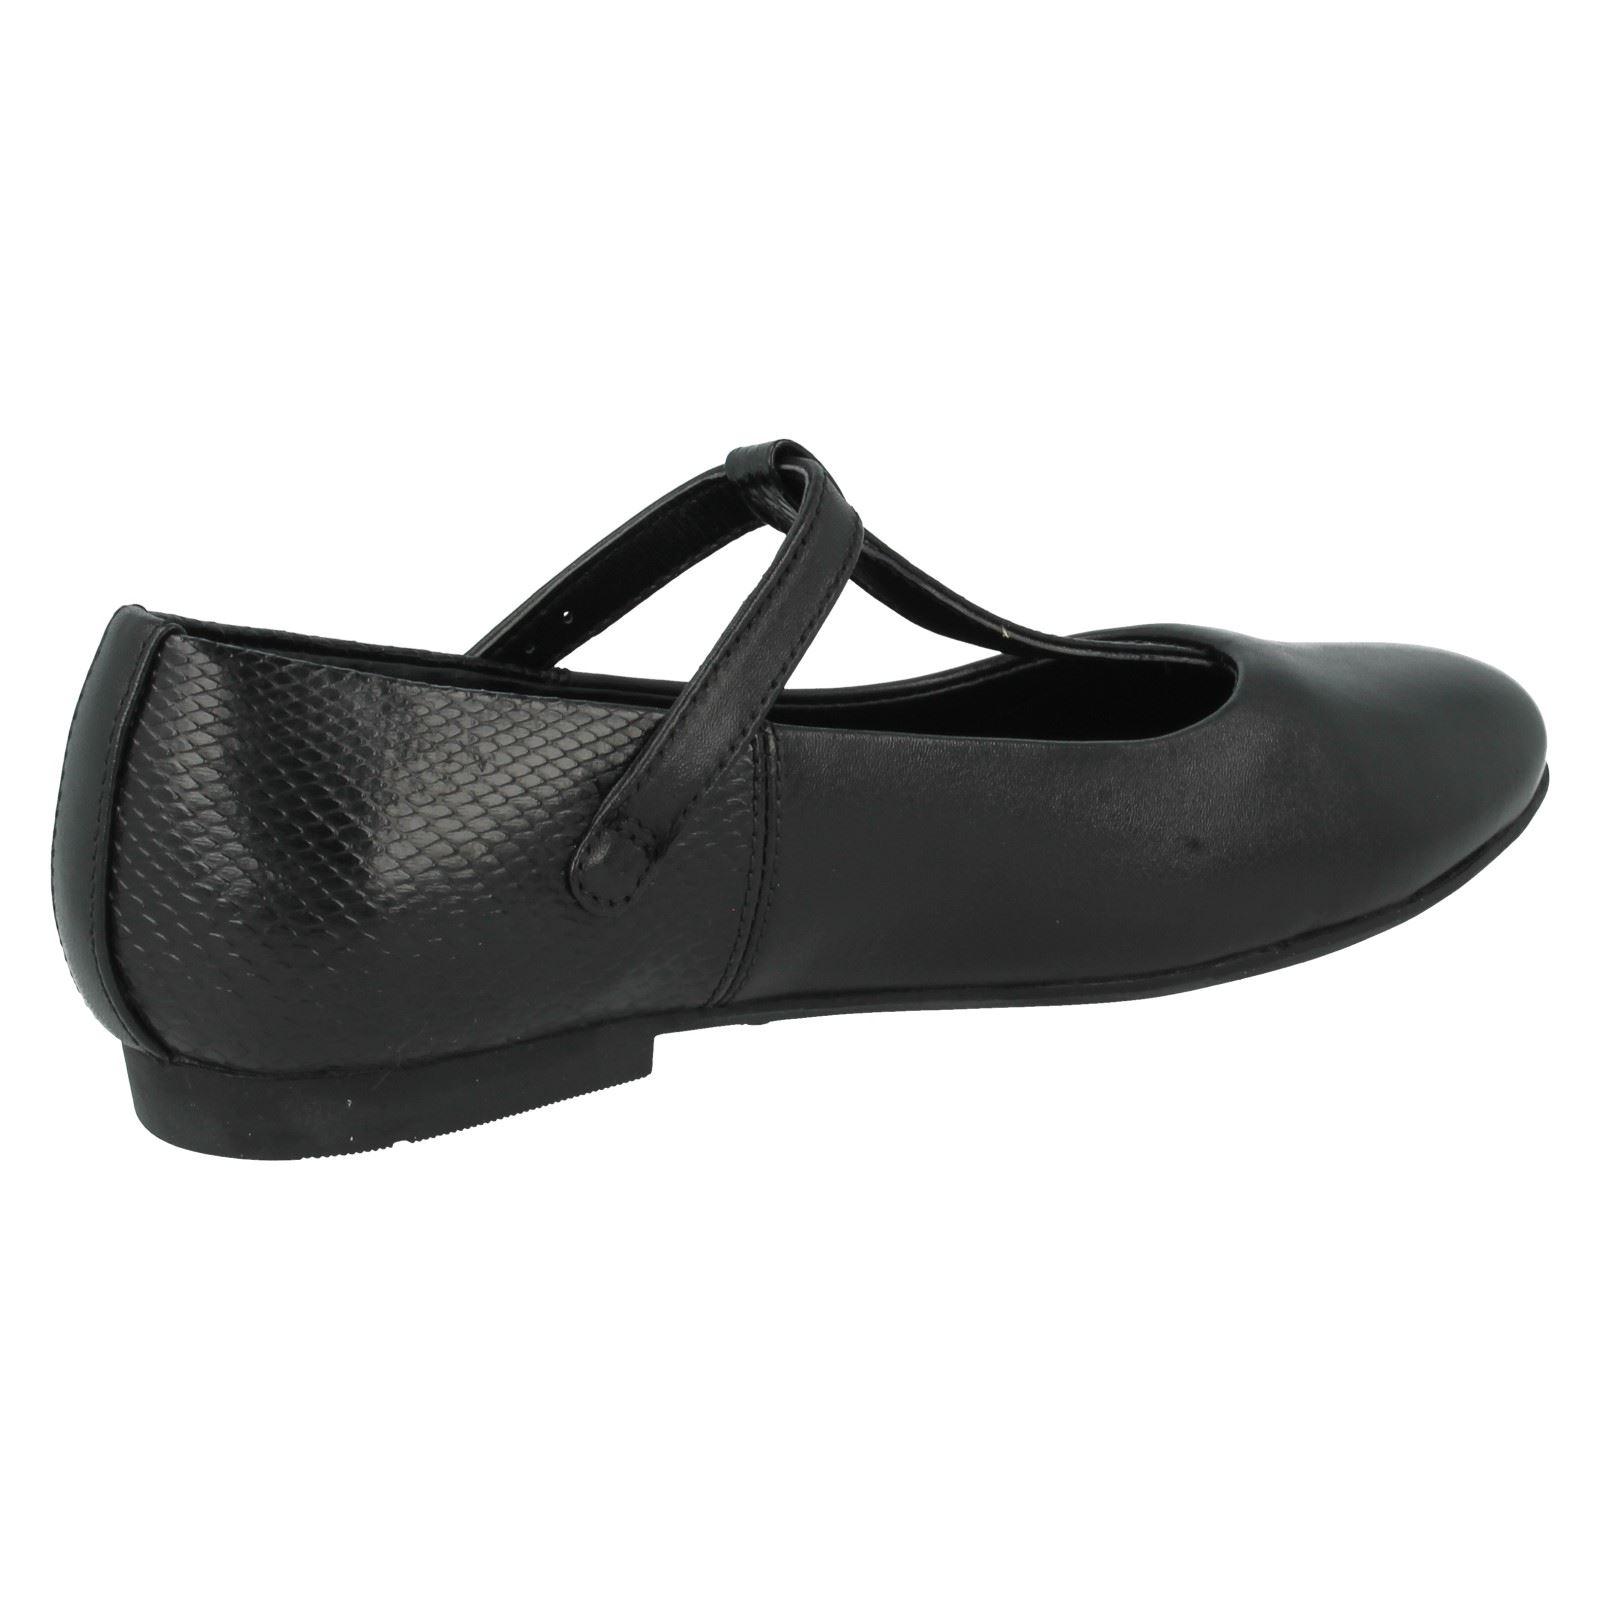 Chicas Clarks Zapatos Erica Lola